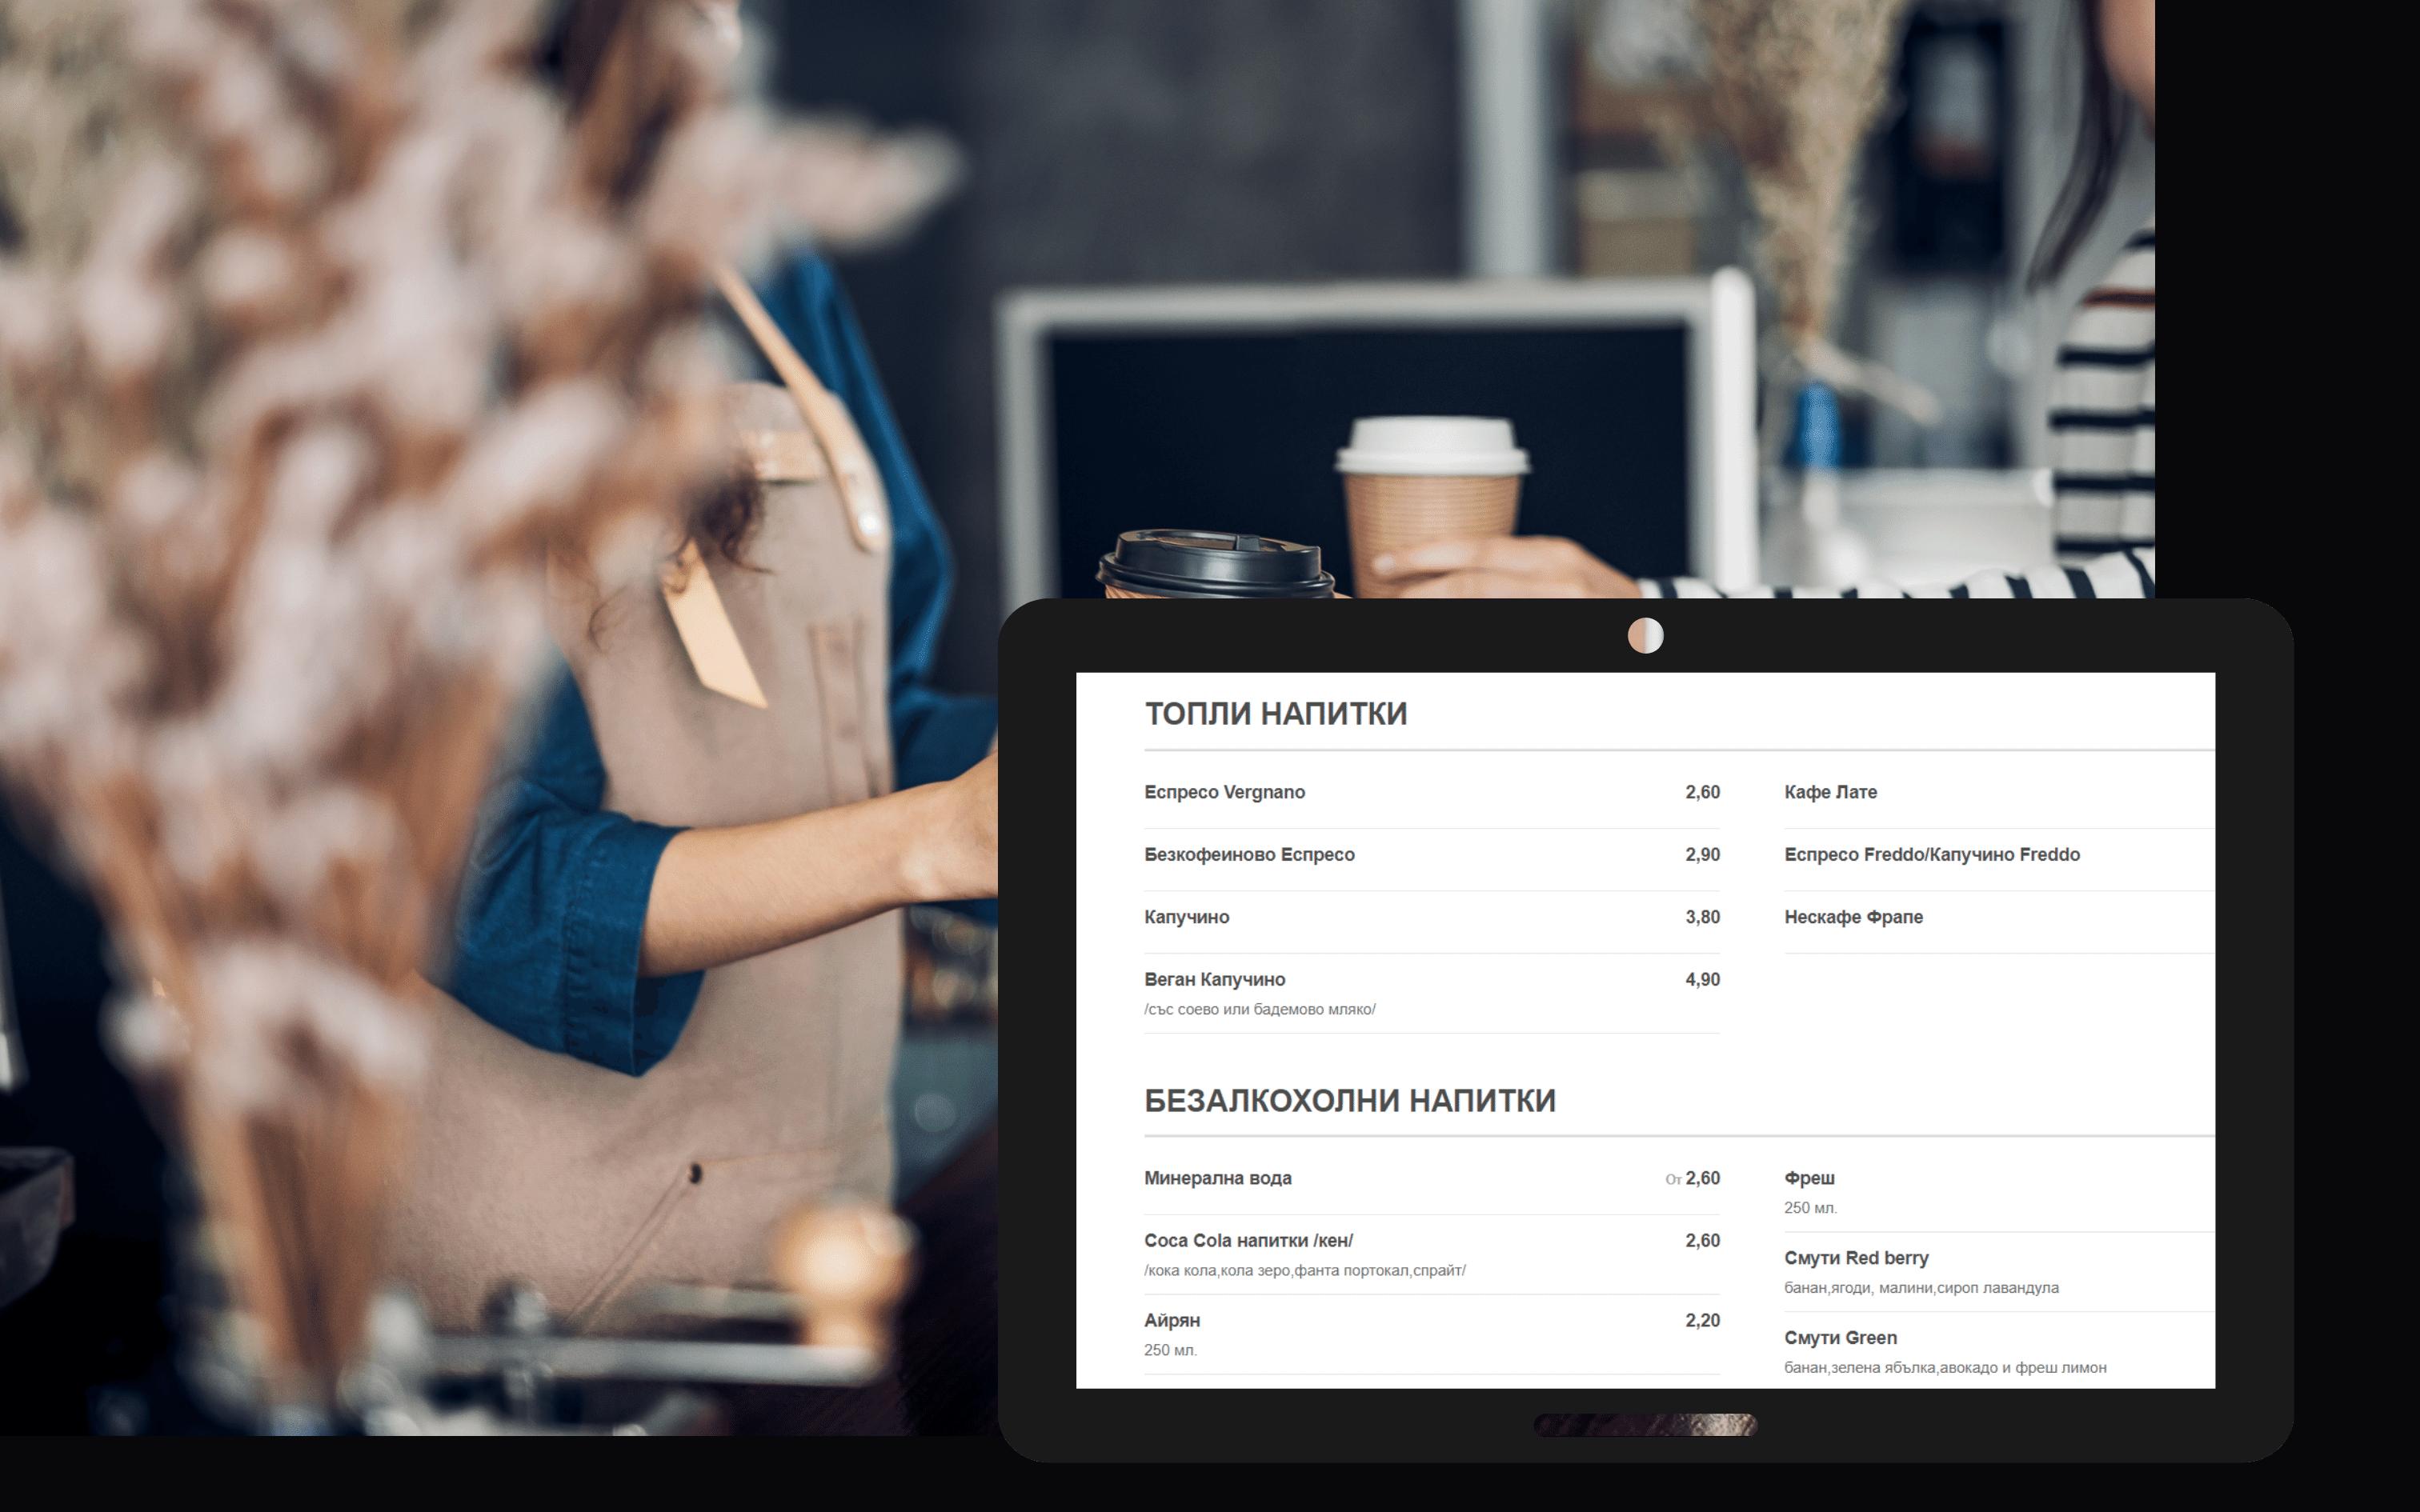 Sofia Orders Coffee Shop